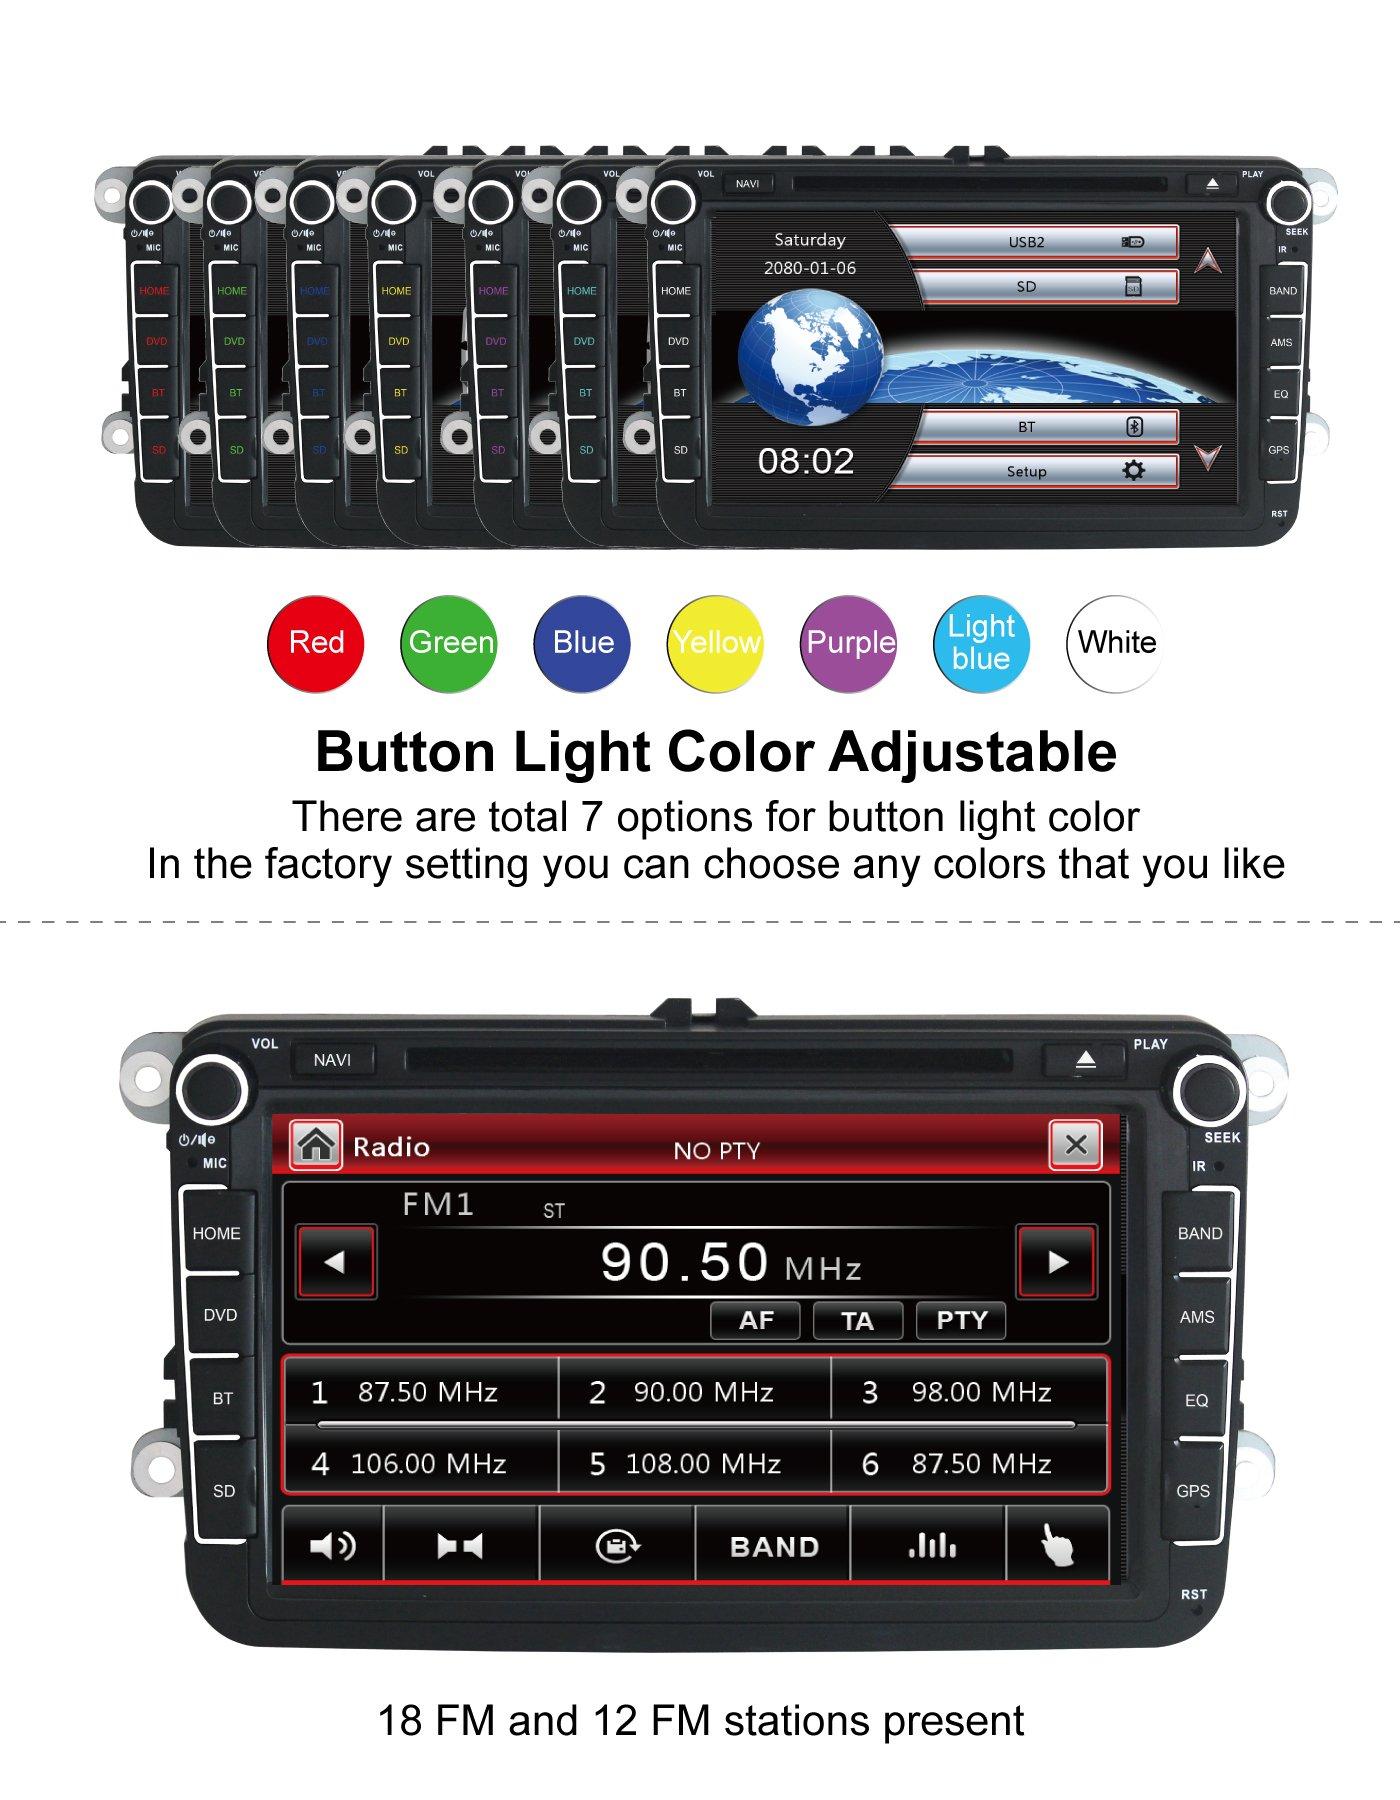 Yingly-8-Zoll-2-Din-Autoradio-fr-VW-Golf-Skoda-Seat-mit-Wince-System-DVD-Player-GPS-Navigation-FM-AM-Radio-Bluetooth-USB-SD-untersttzt-Park-Kamera-Lenkrad-Bedienung-1080P-Video-8GB-Kartenmaterial